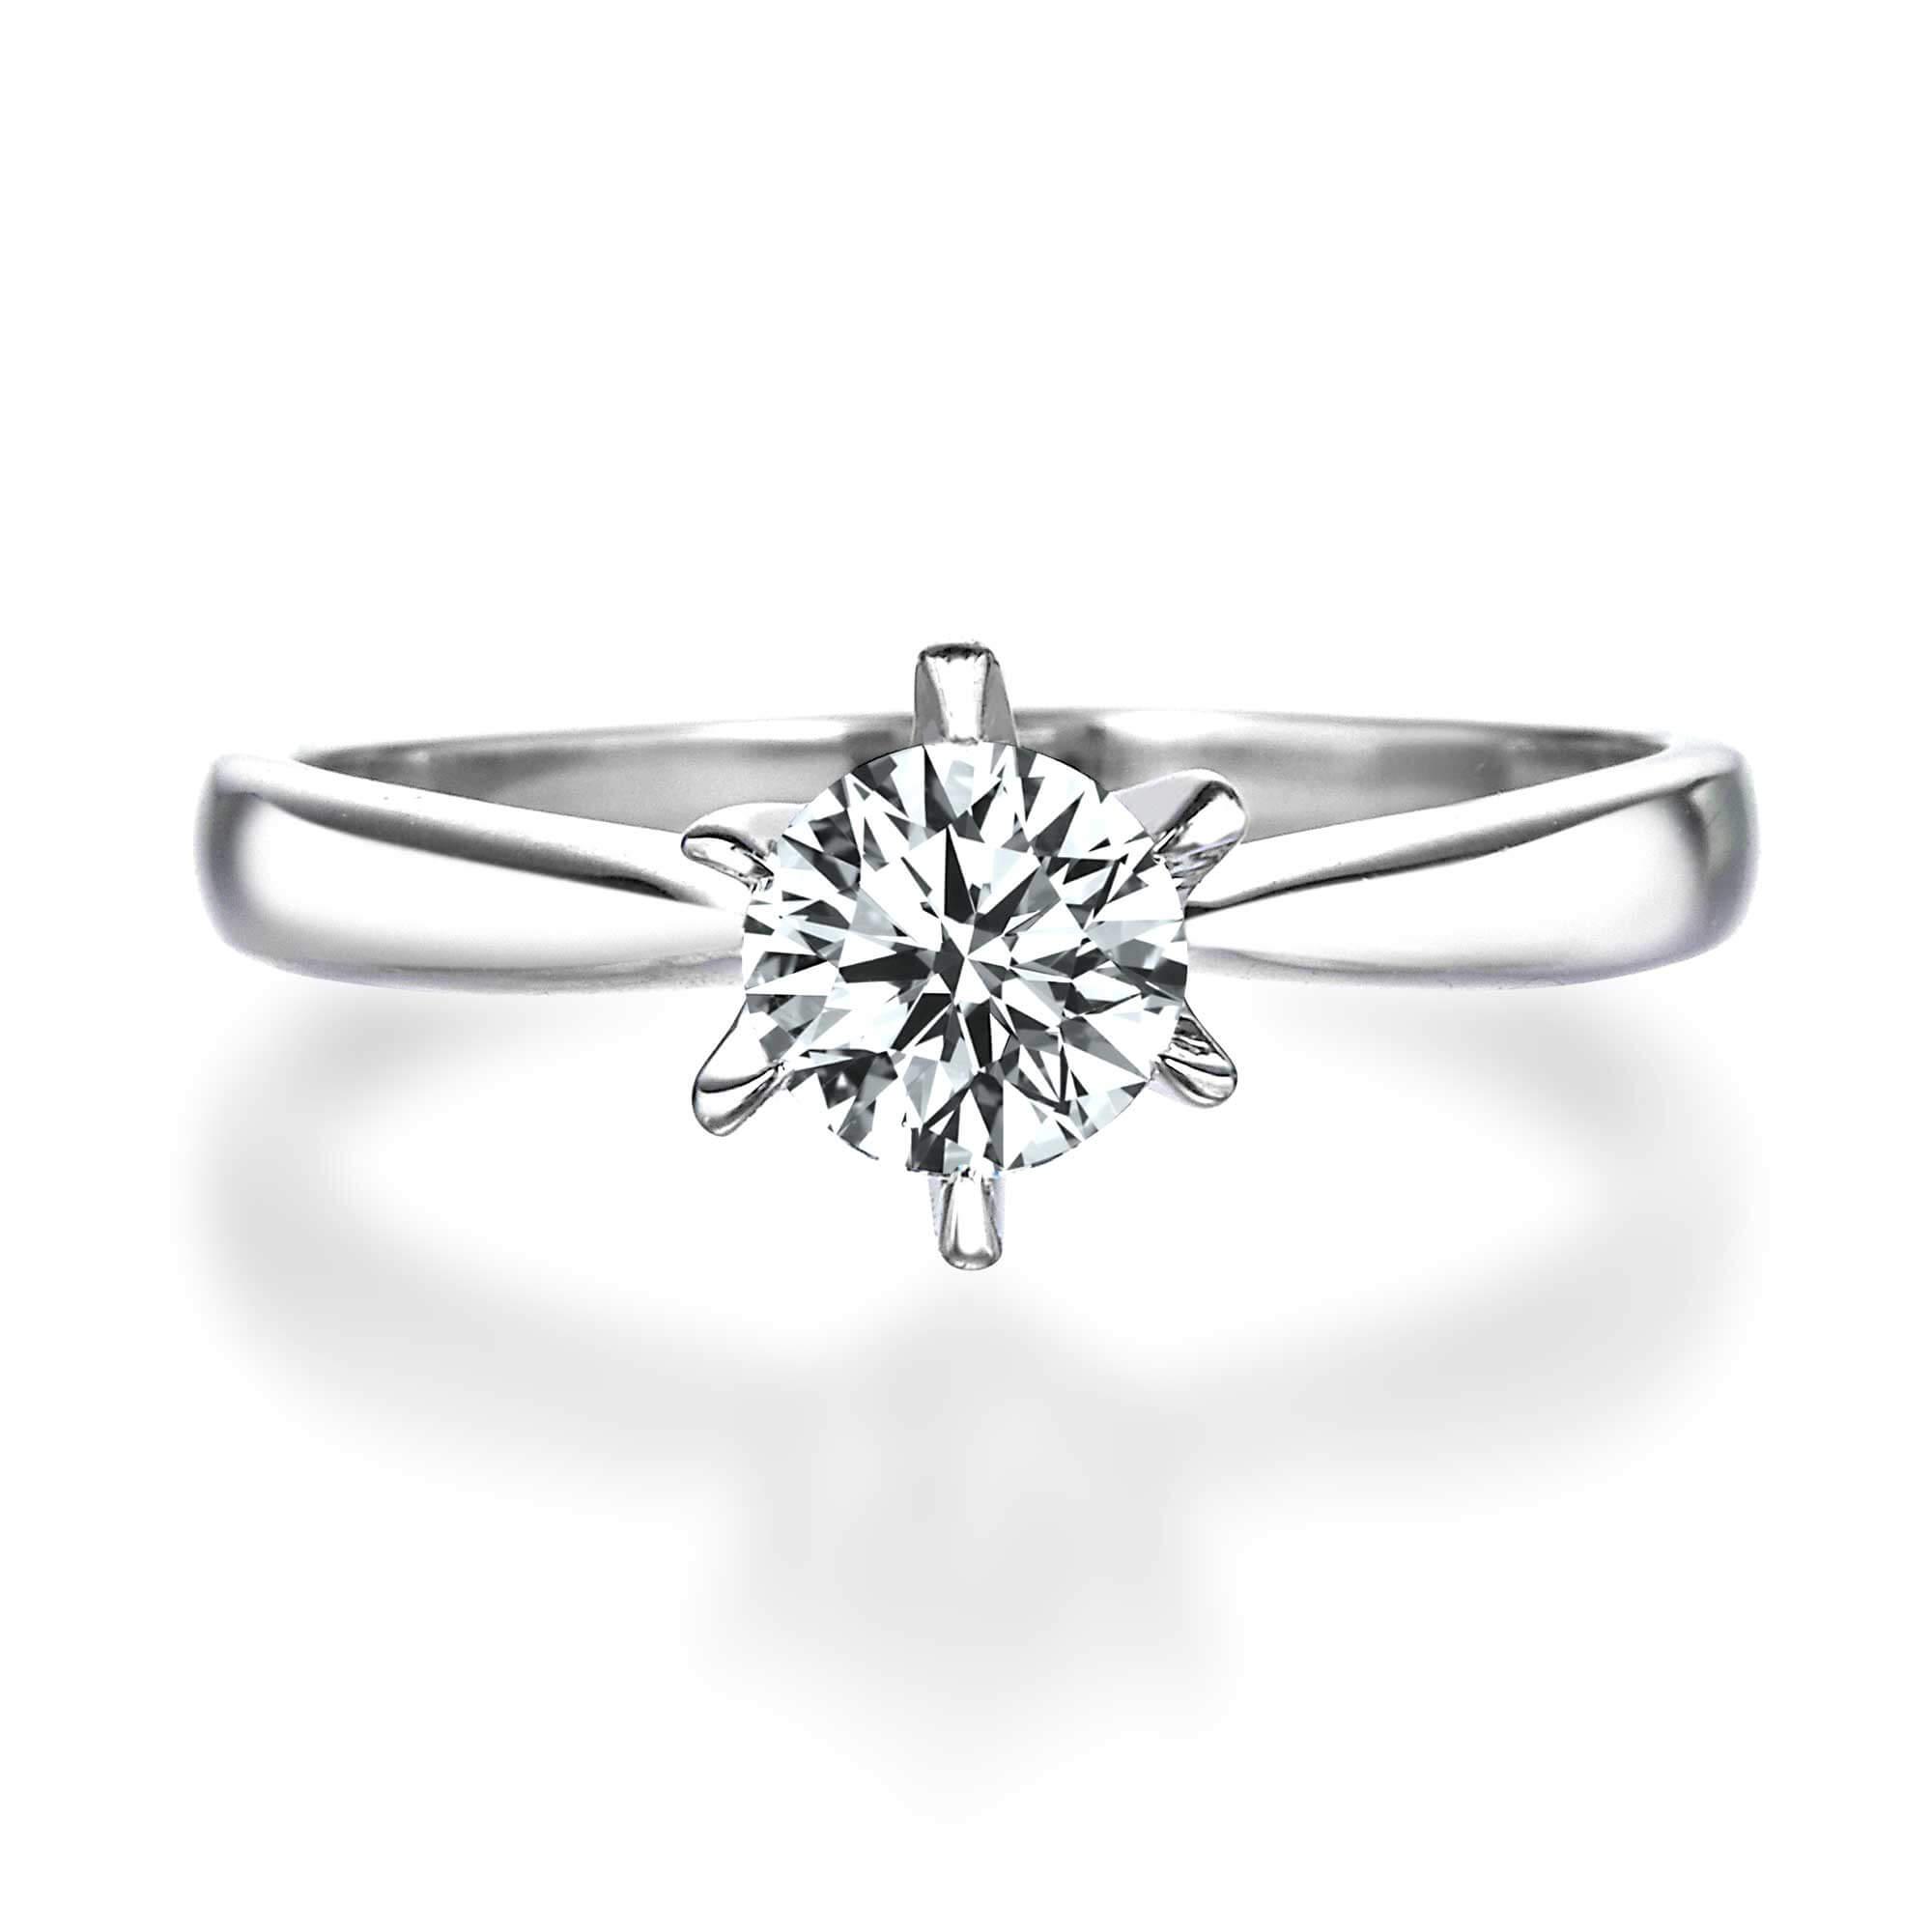 online store 8f577 a06de 6本爪クラシカルラウンドダイヤモンドリング | 結婚指輪・婚約 ...